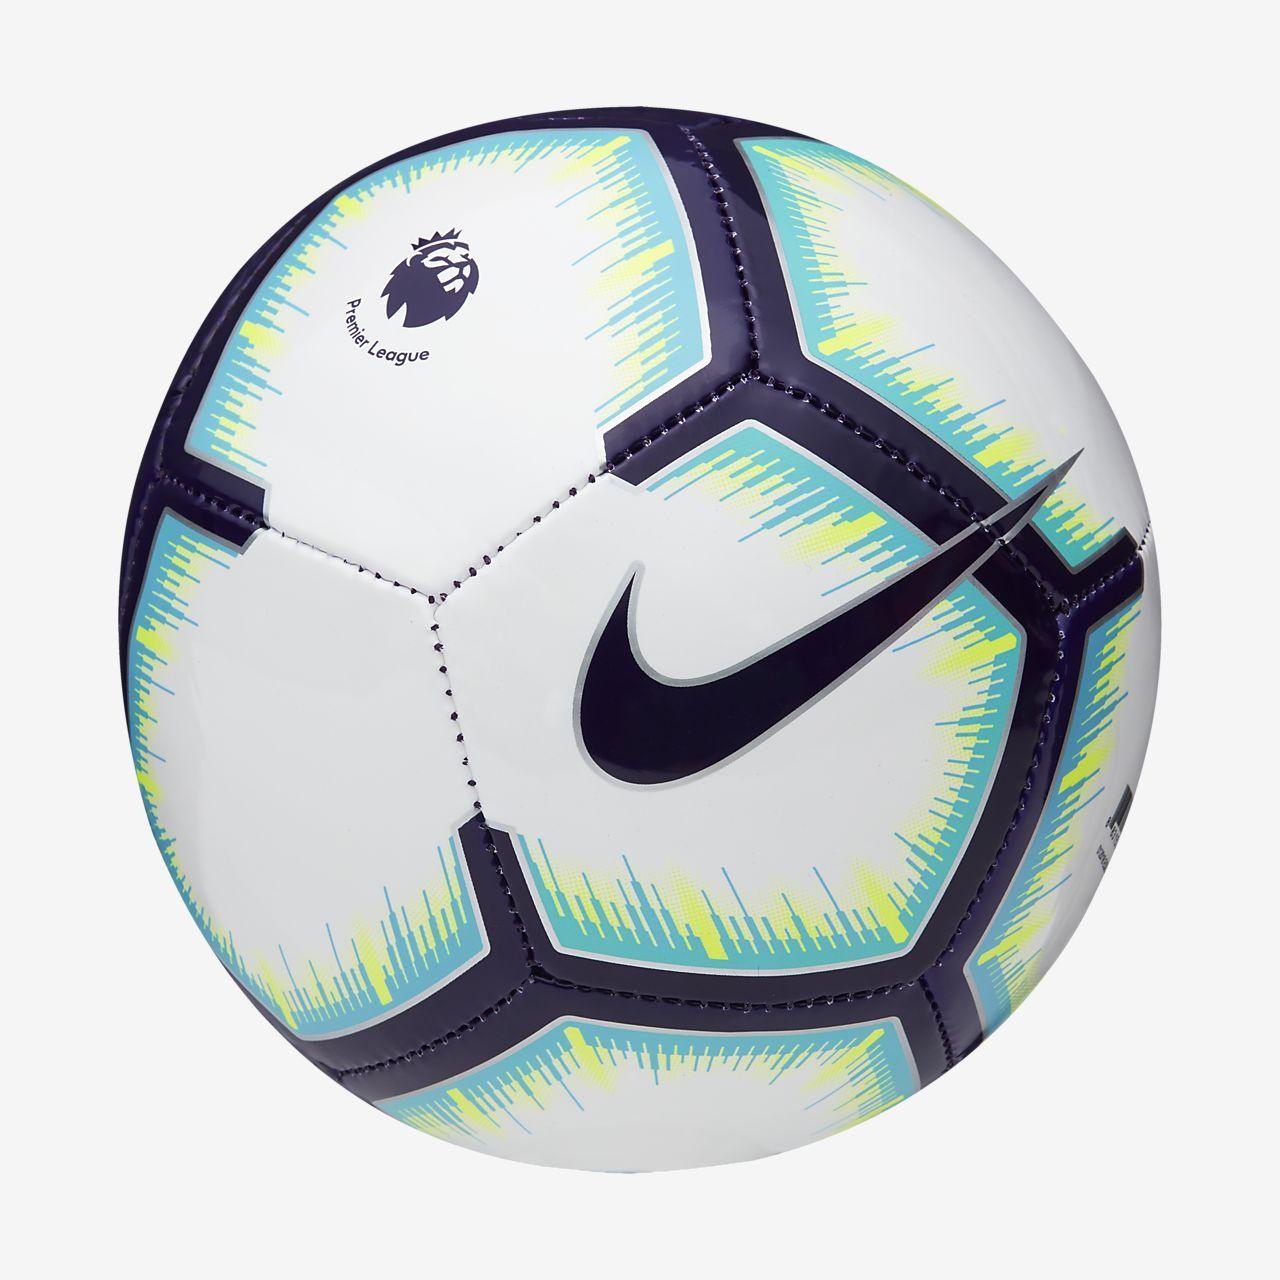 Premier League Skills - fodbold